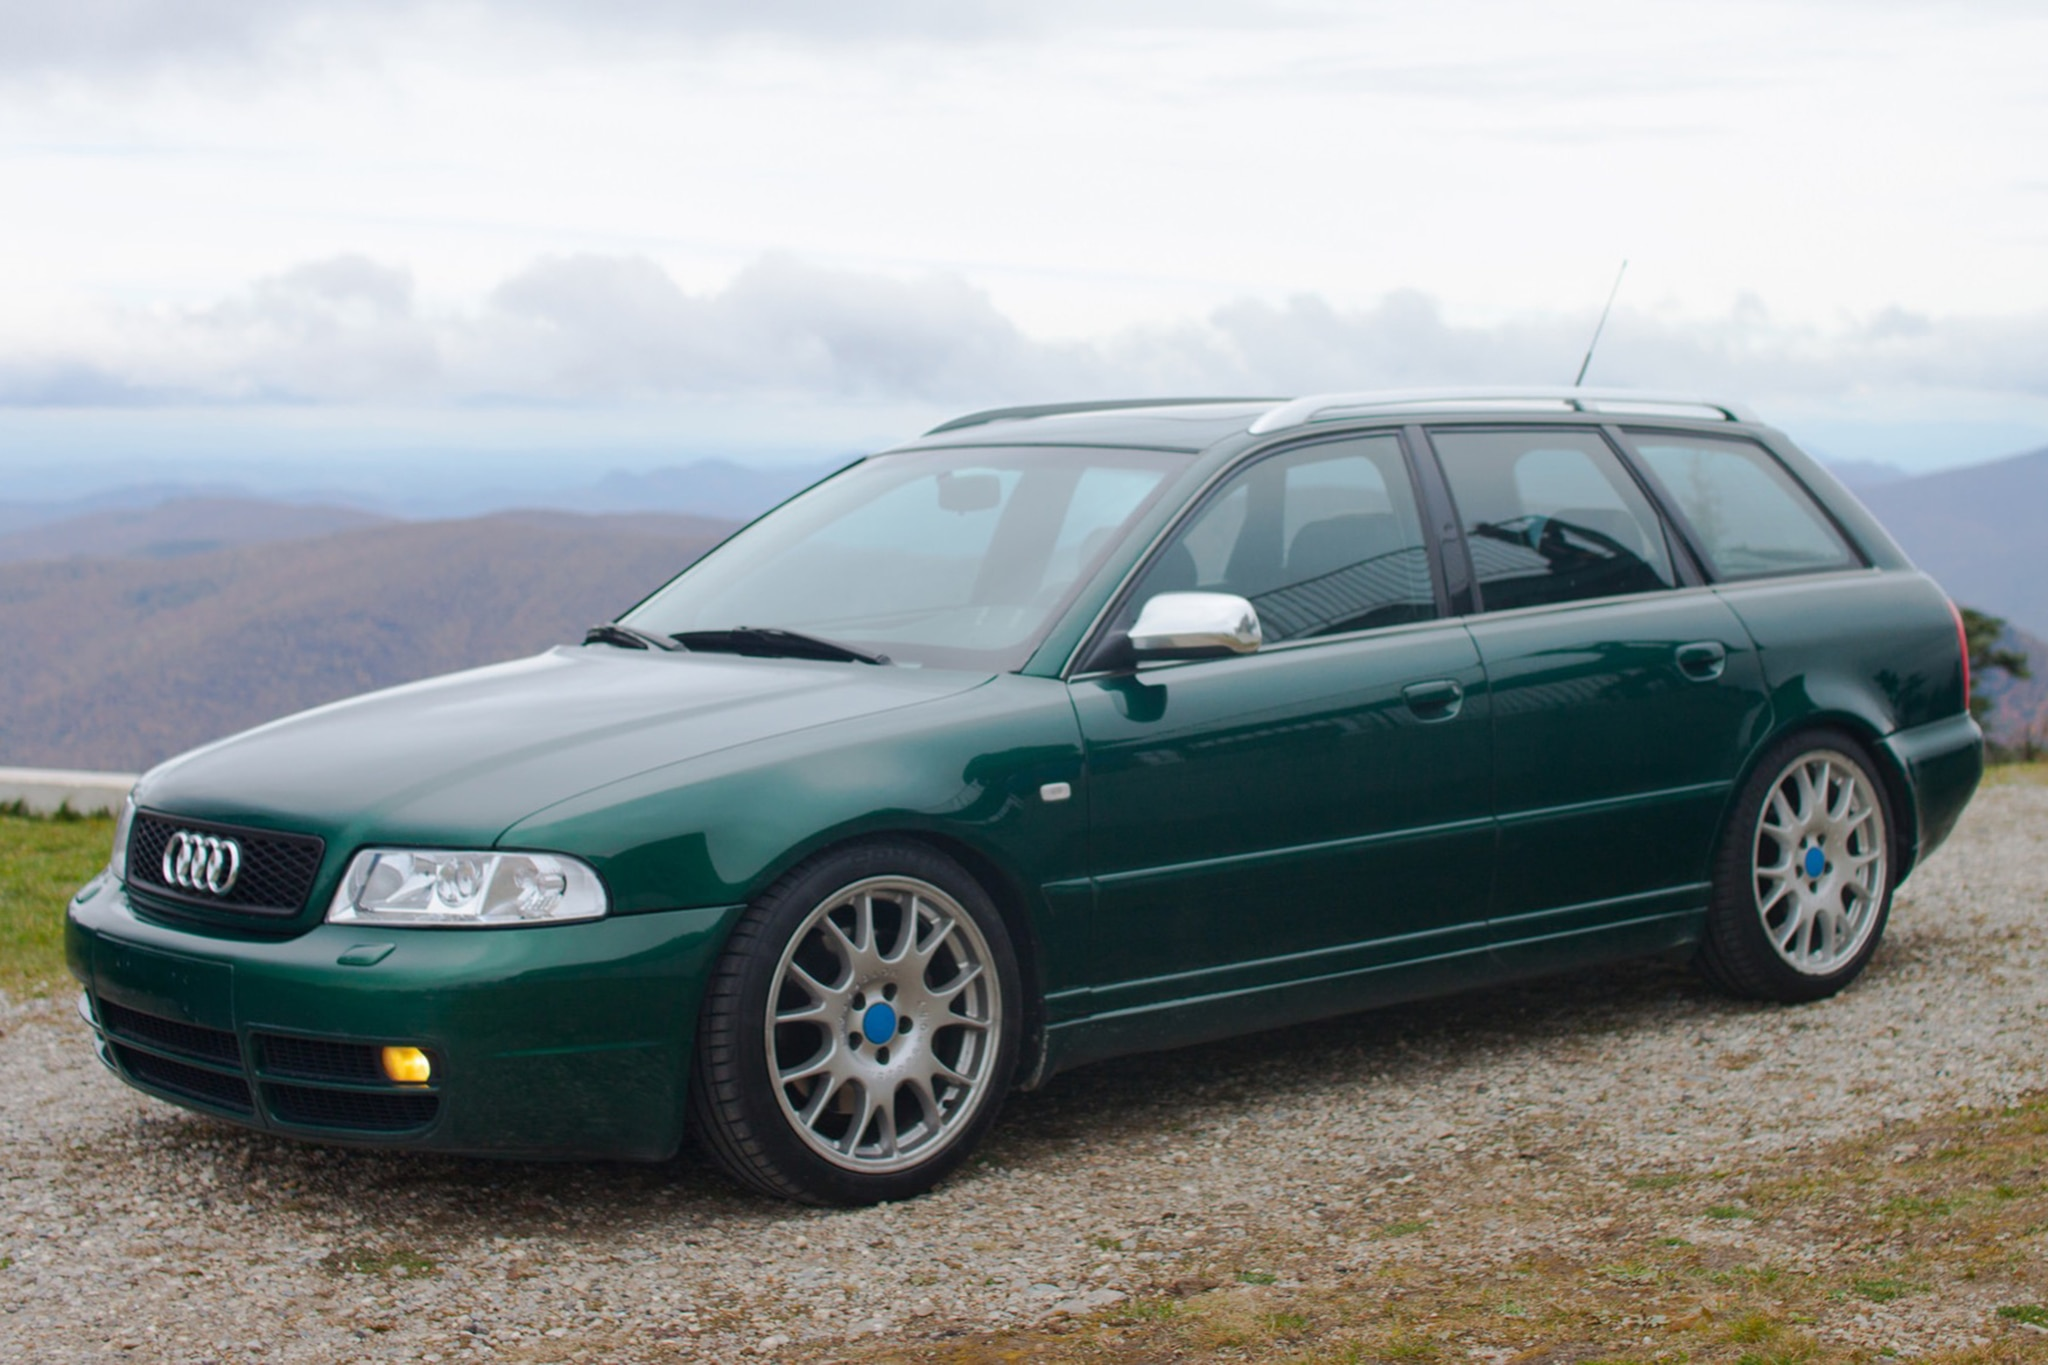 2001 Audi S4 Avant Just Listed